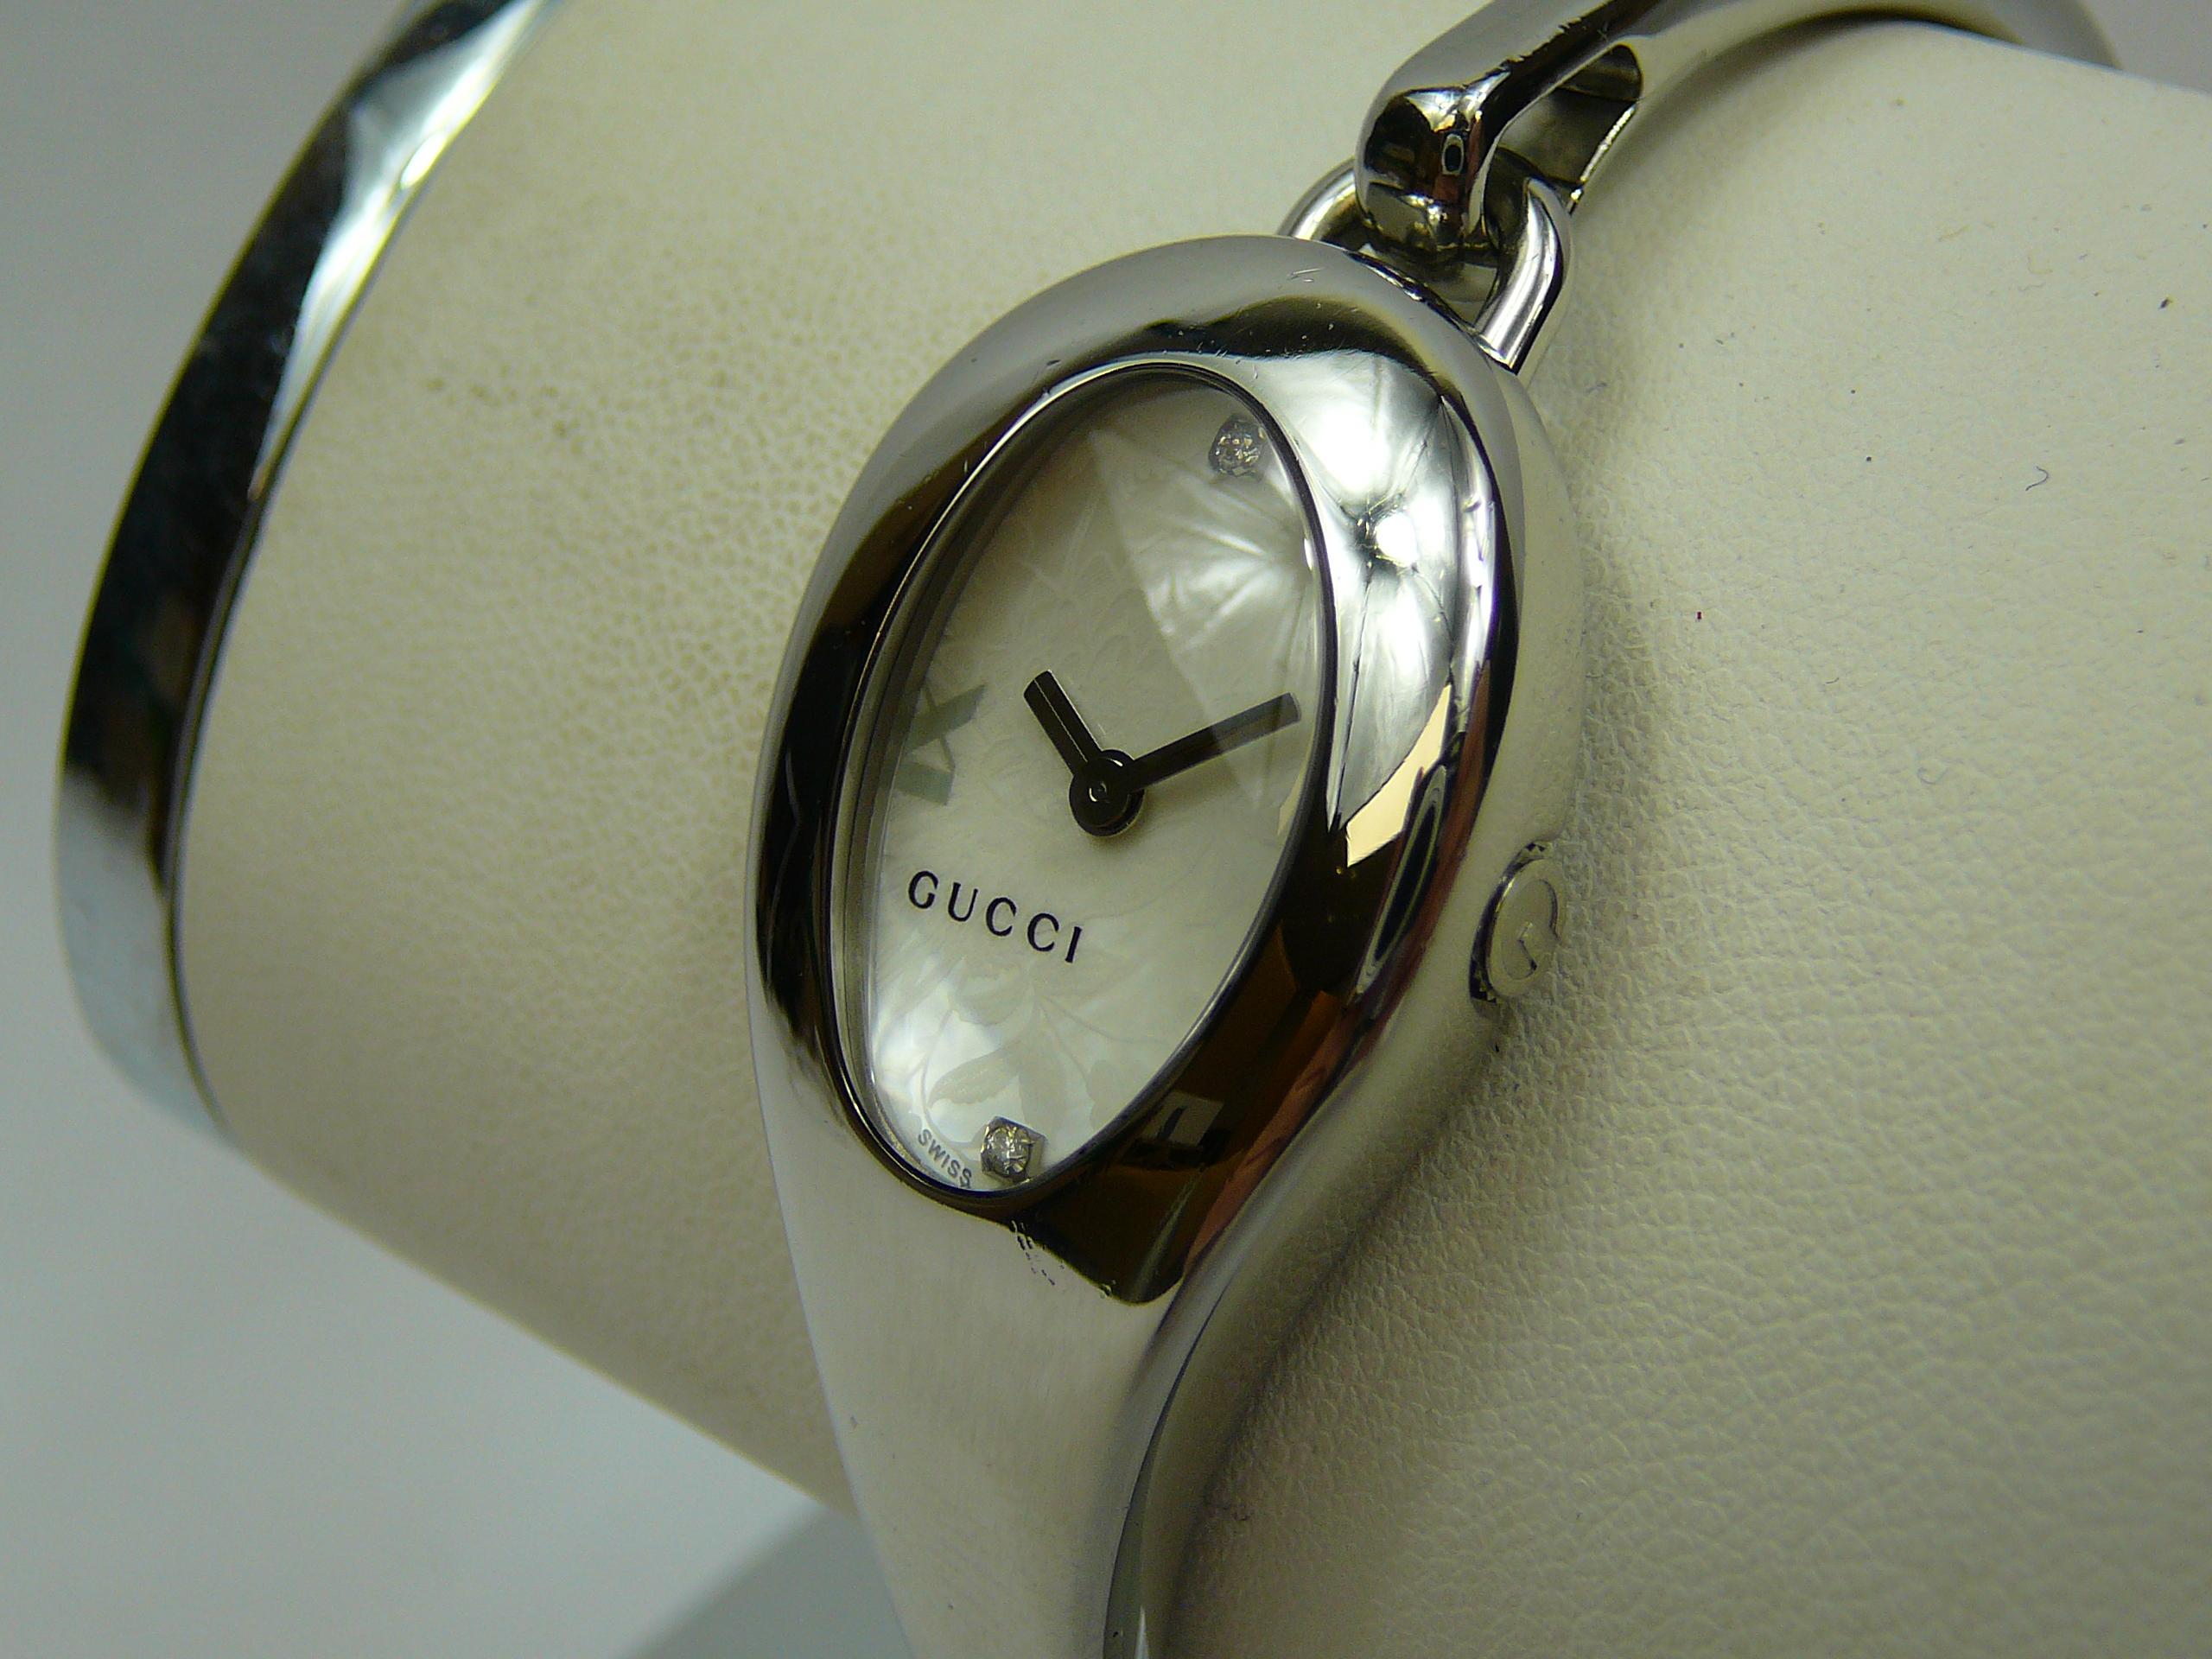 Ladies Gucci Bangle Wrist Watch - Image 2 of 3